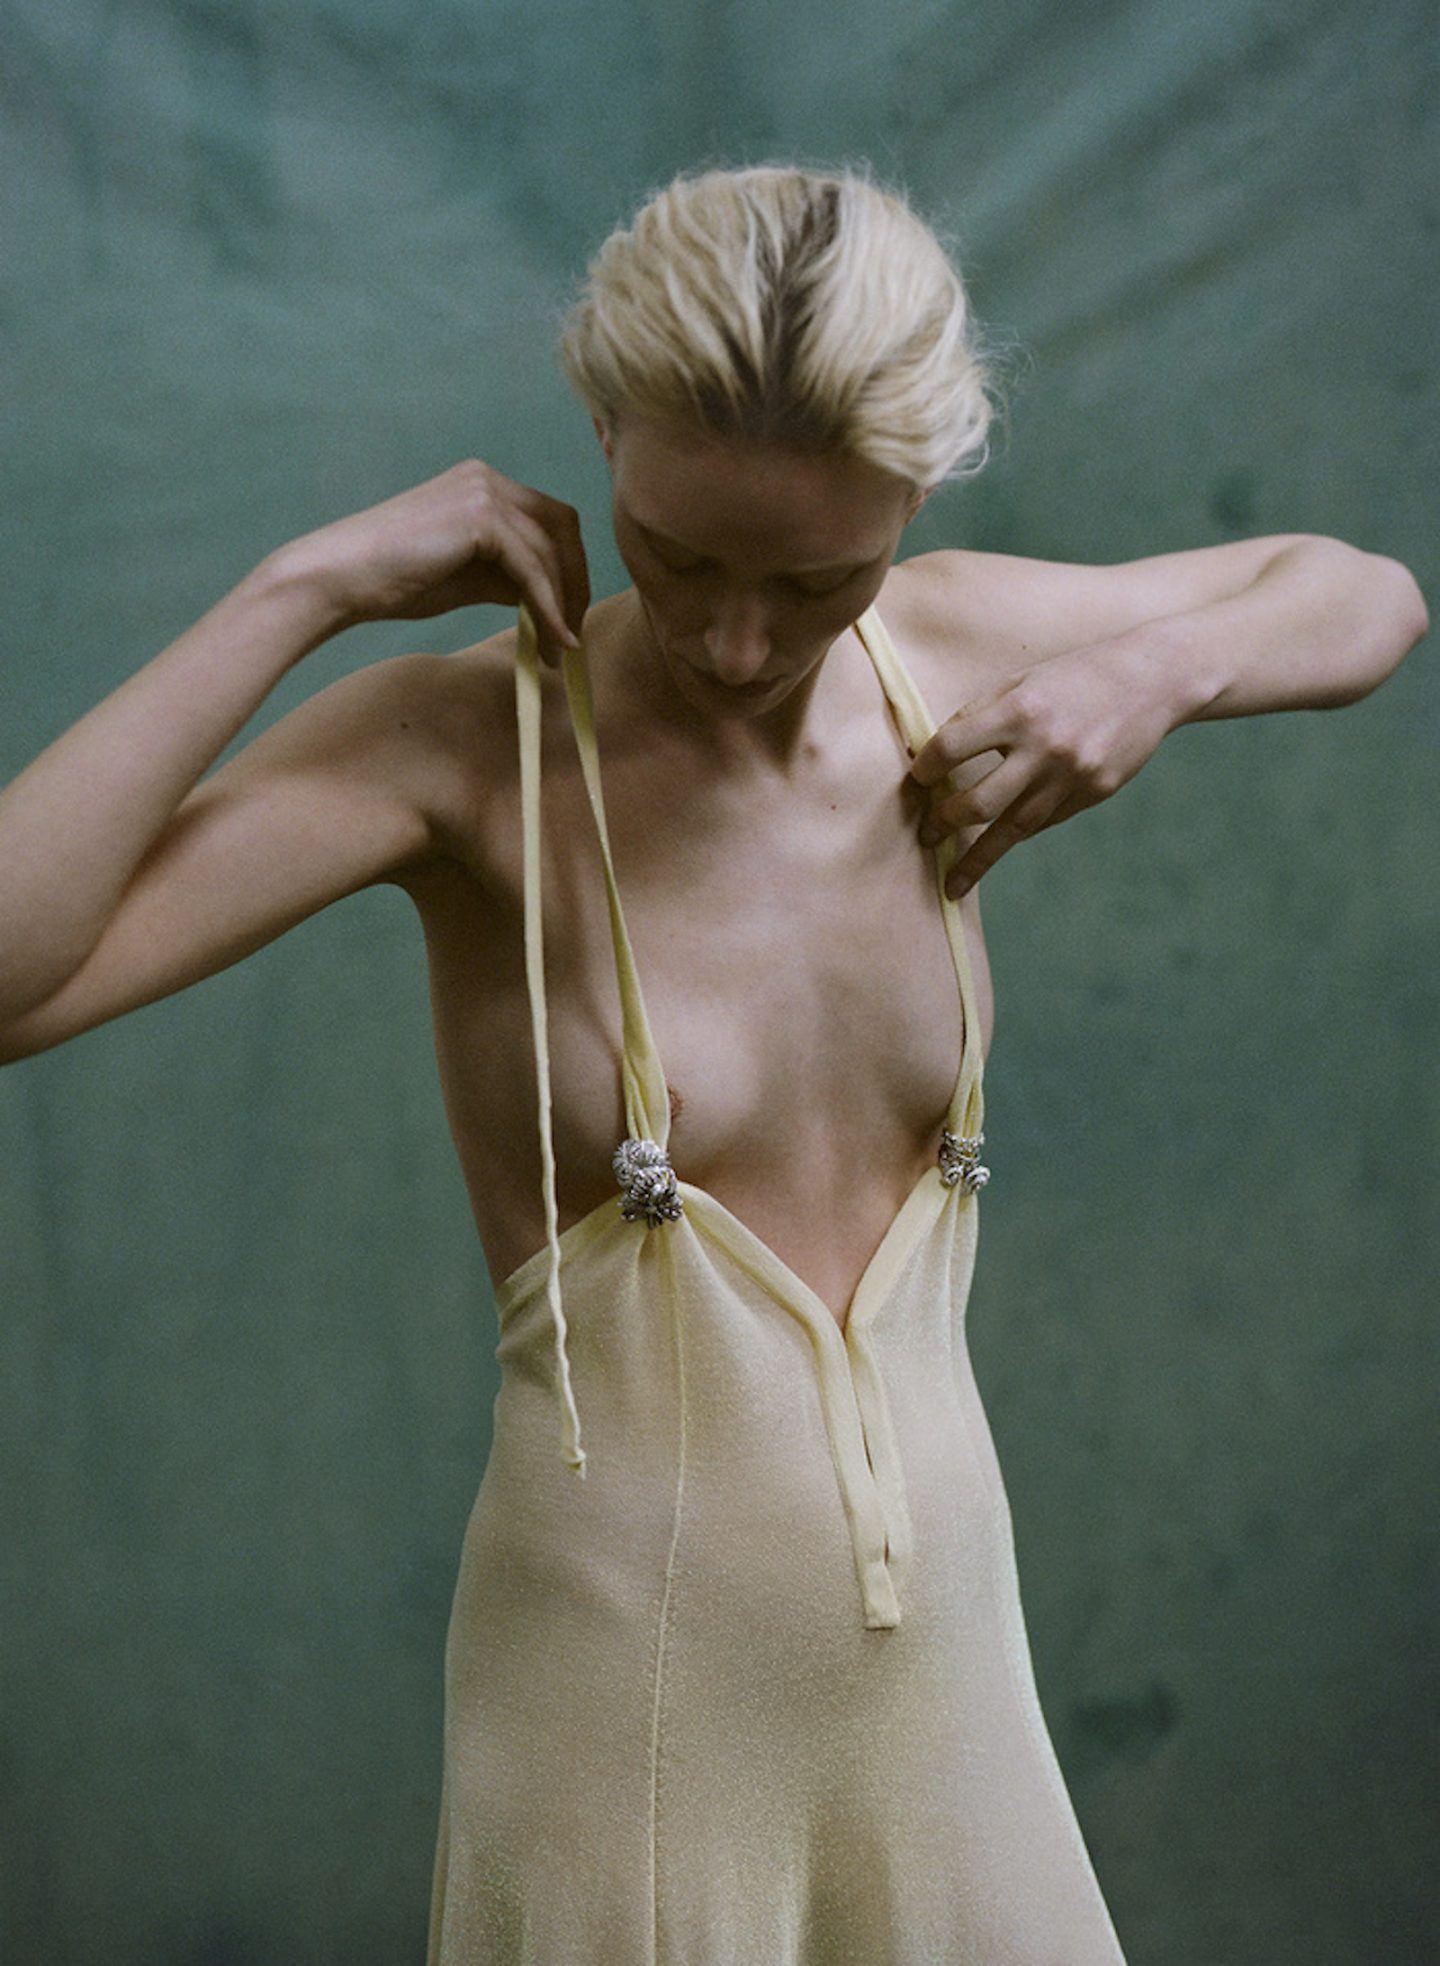 IGNANT-Photography-Sonia-Szostak-017